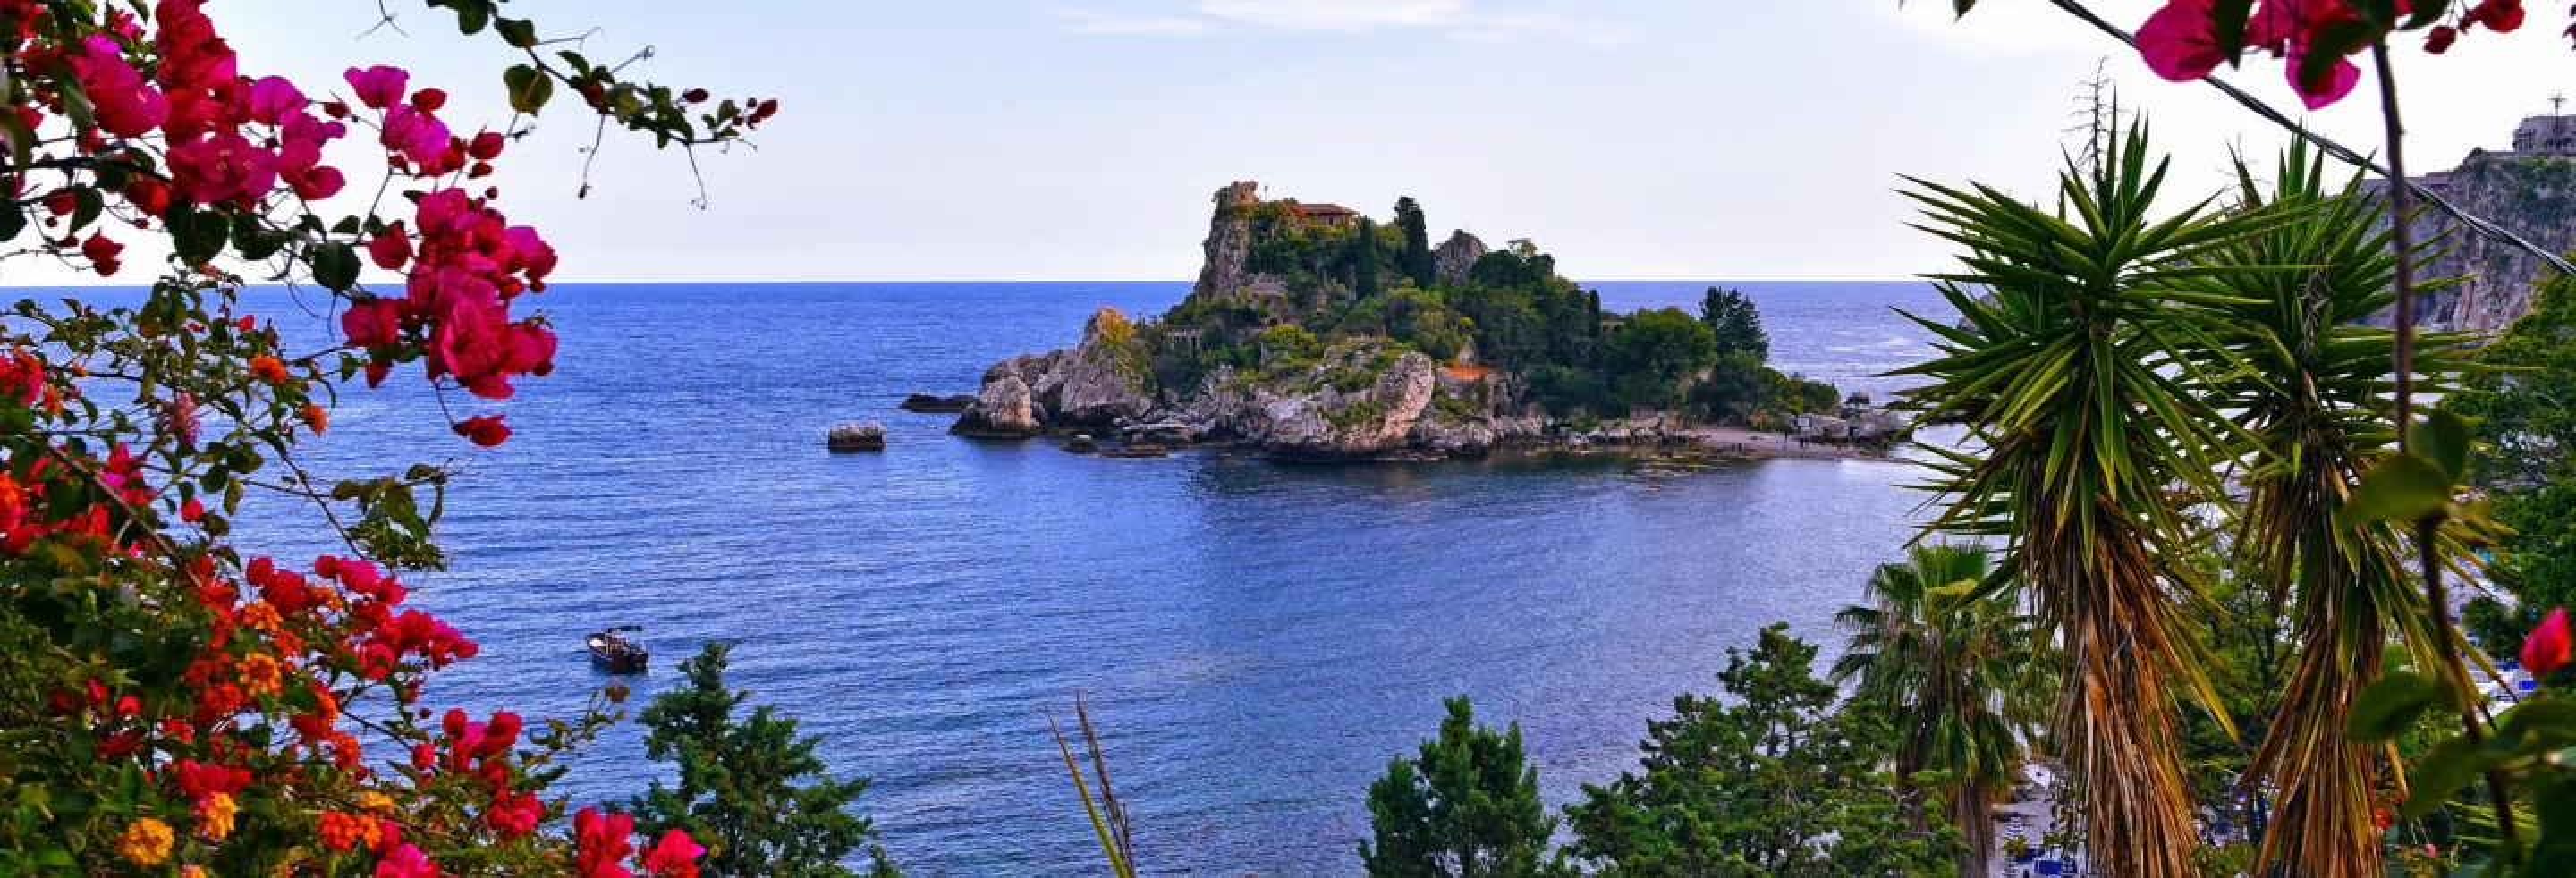 Excursão a Taormina e Isola Bella